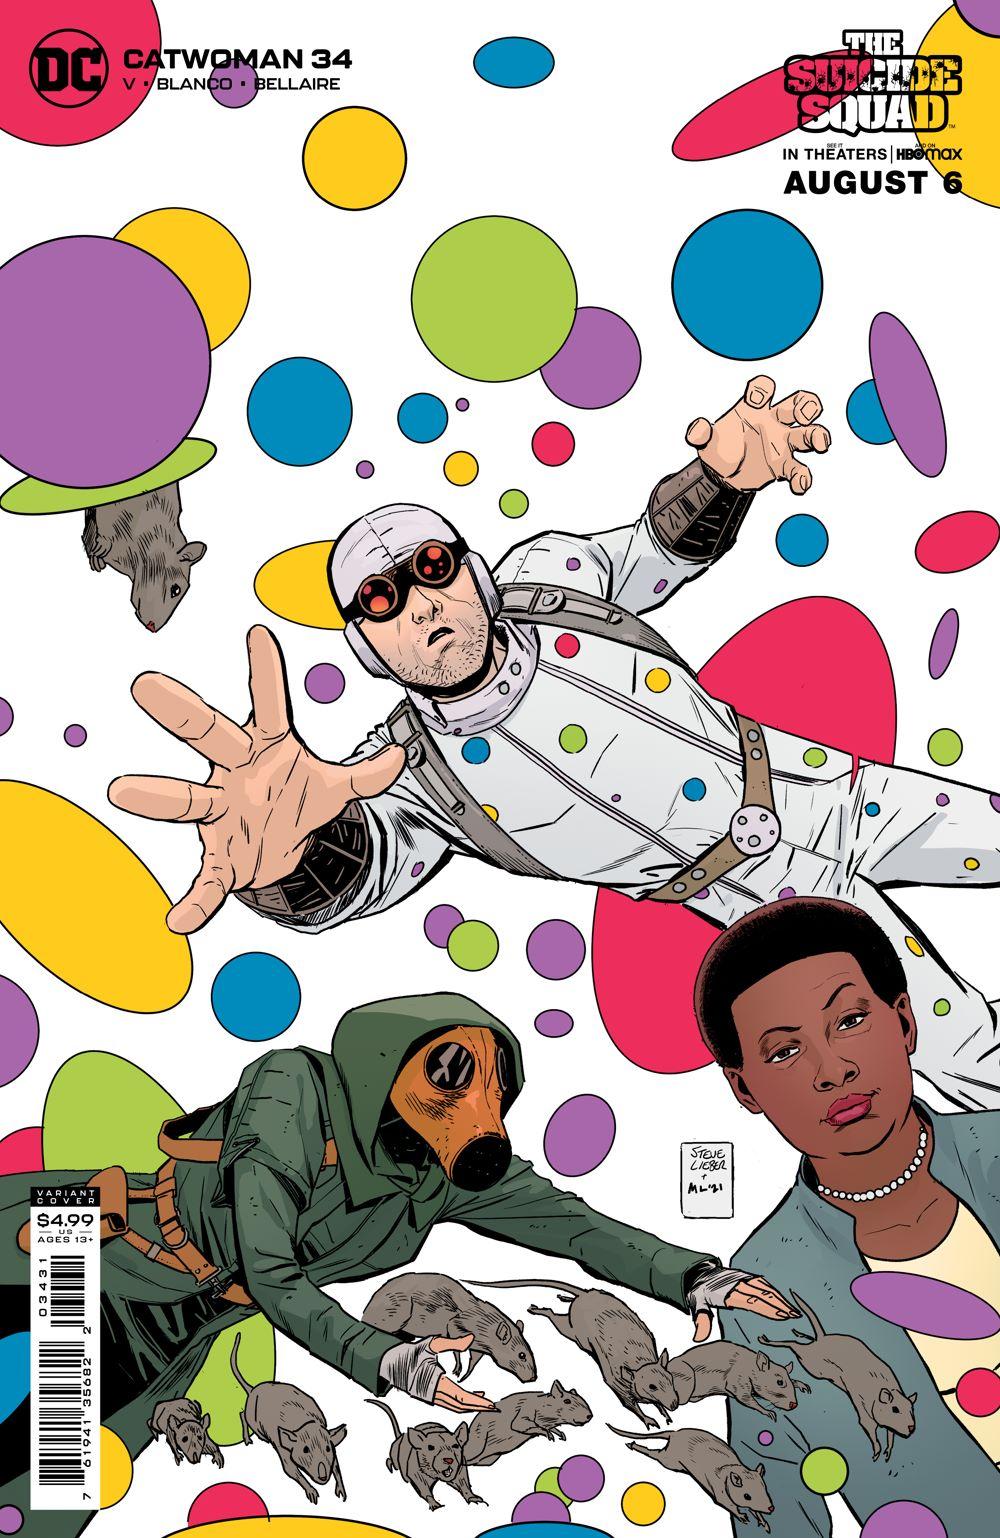 CTW_Cv34_SSMOVIE_var_03431 DC Comics August 2021 Solicitations